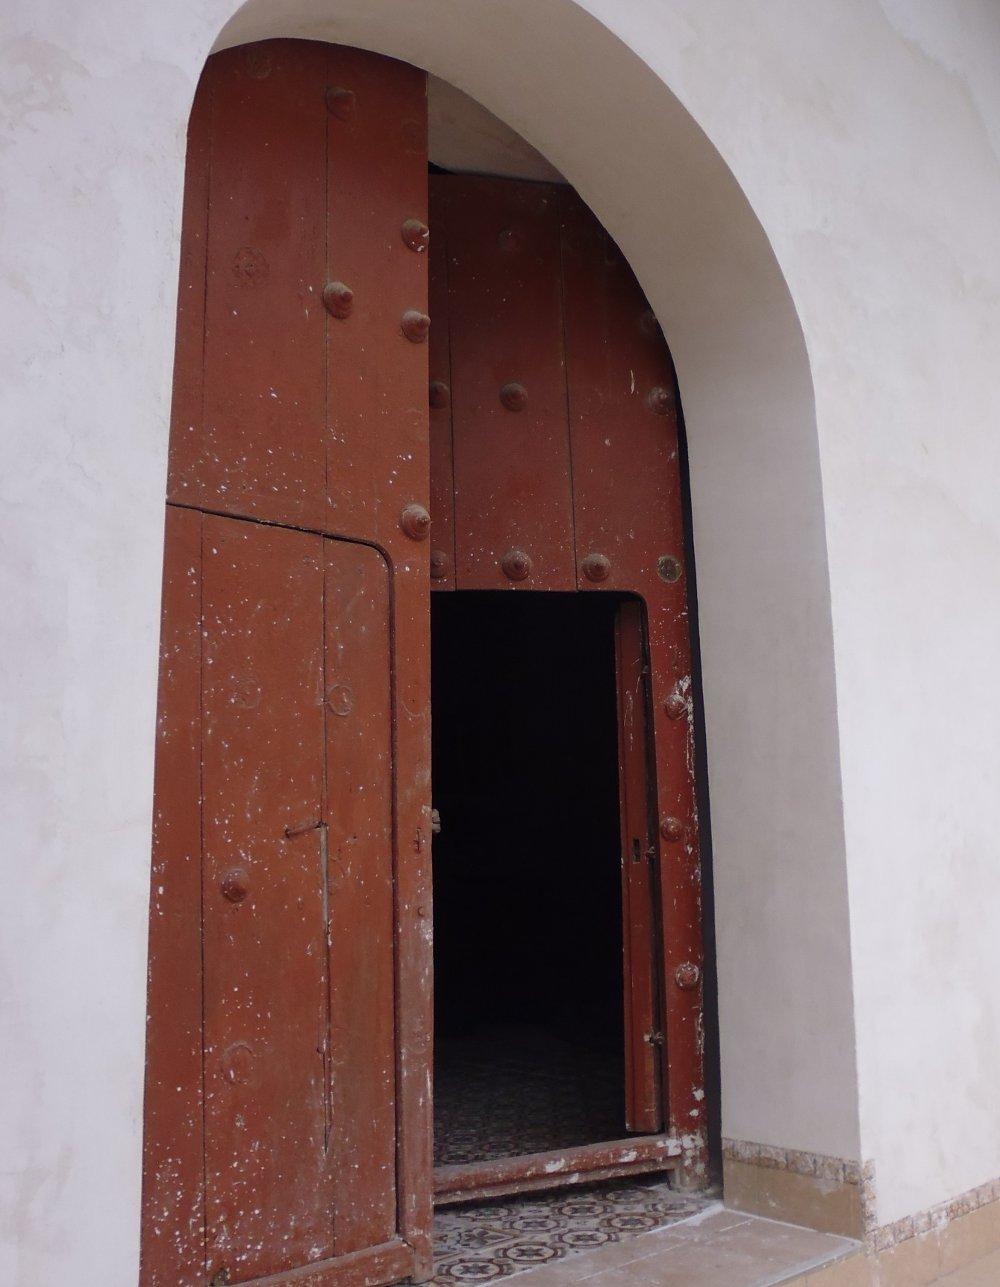 viscas_peru_church_door